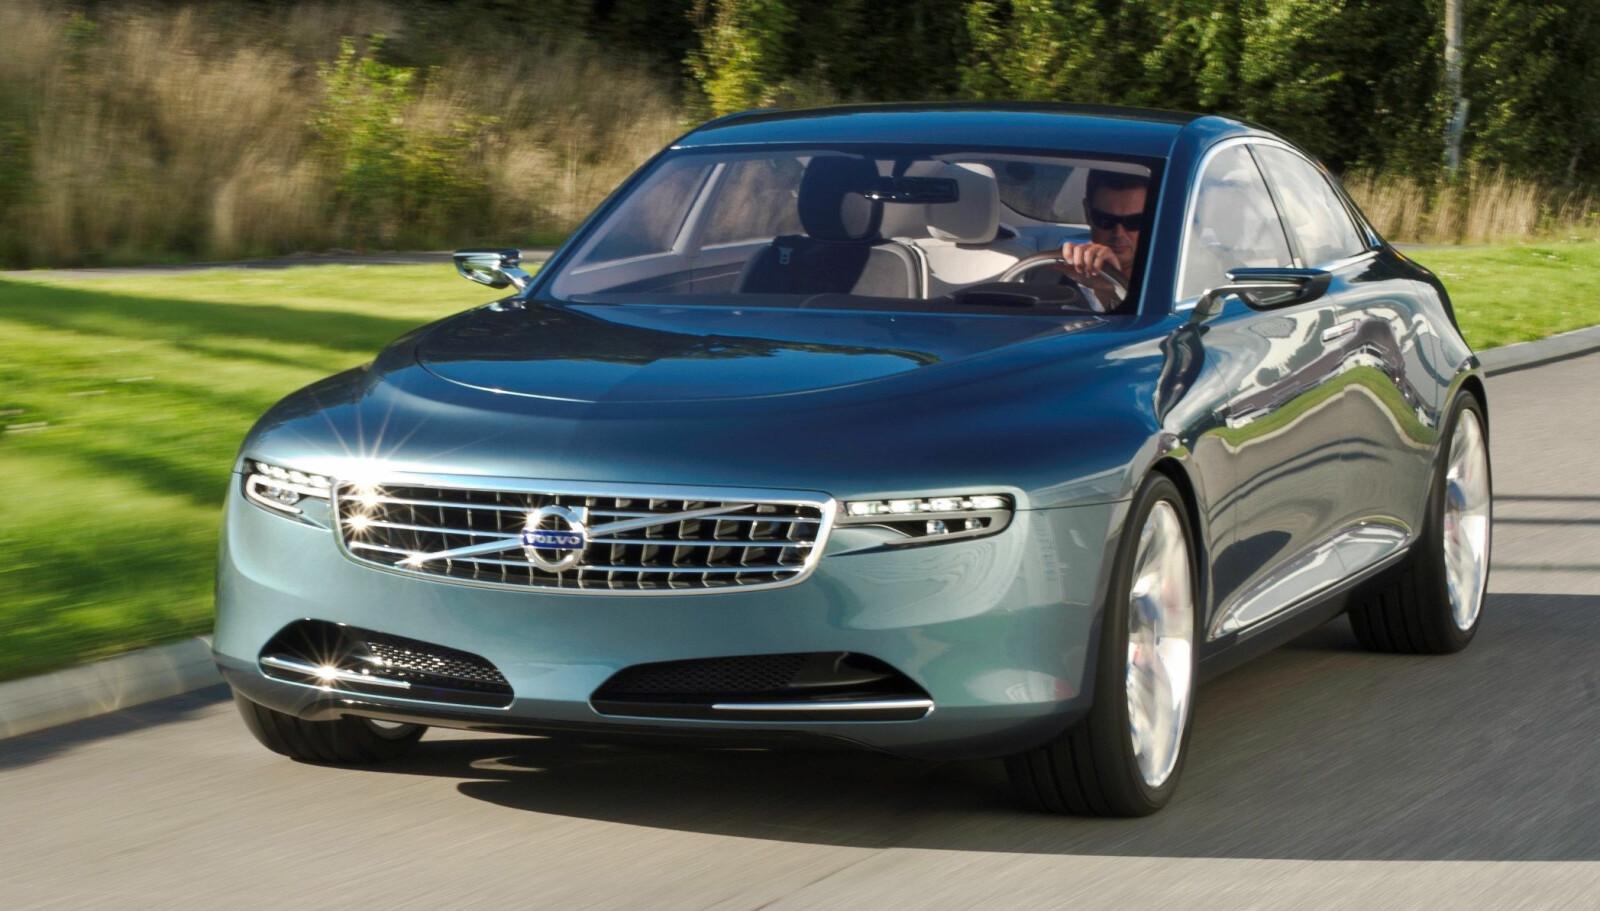 <b>LUKSUS:</b> Volvo Concept You fra 2011 var en luksuriøs og påkostet modell som skulle konkurrere med Mercedes S-klasse og BMW 7-serie.